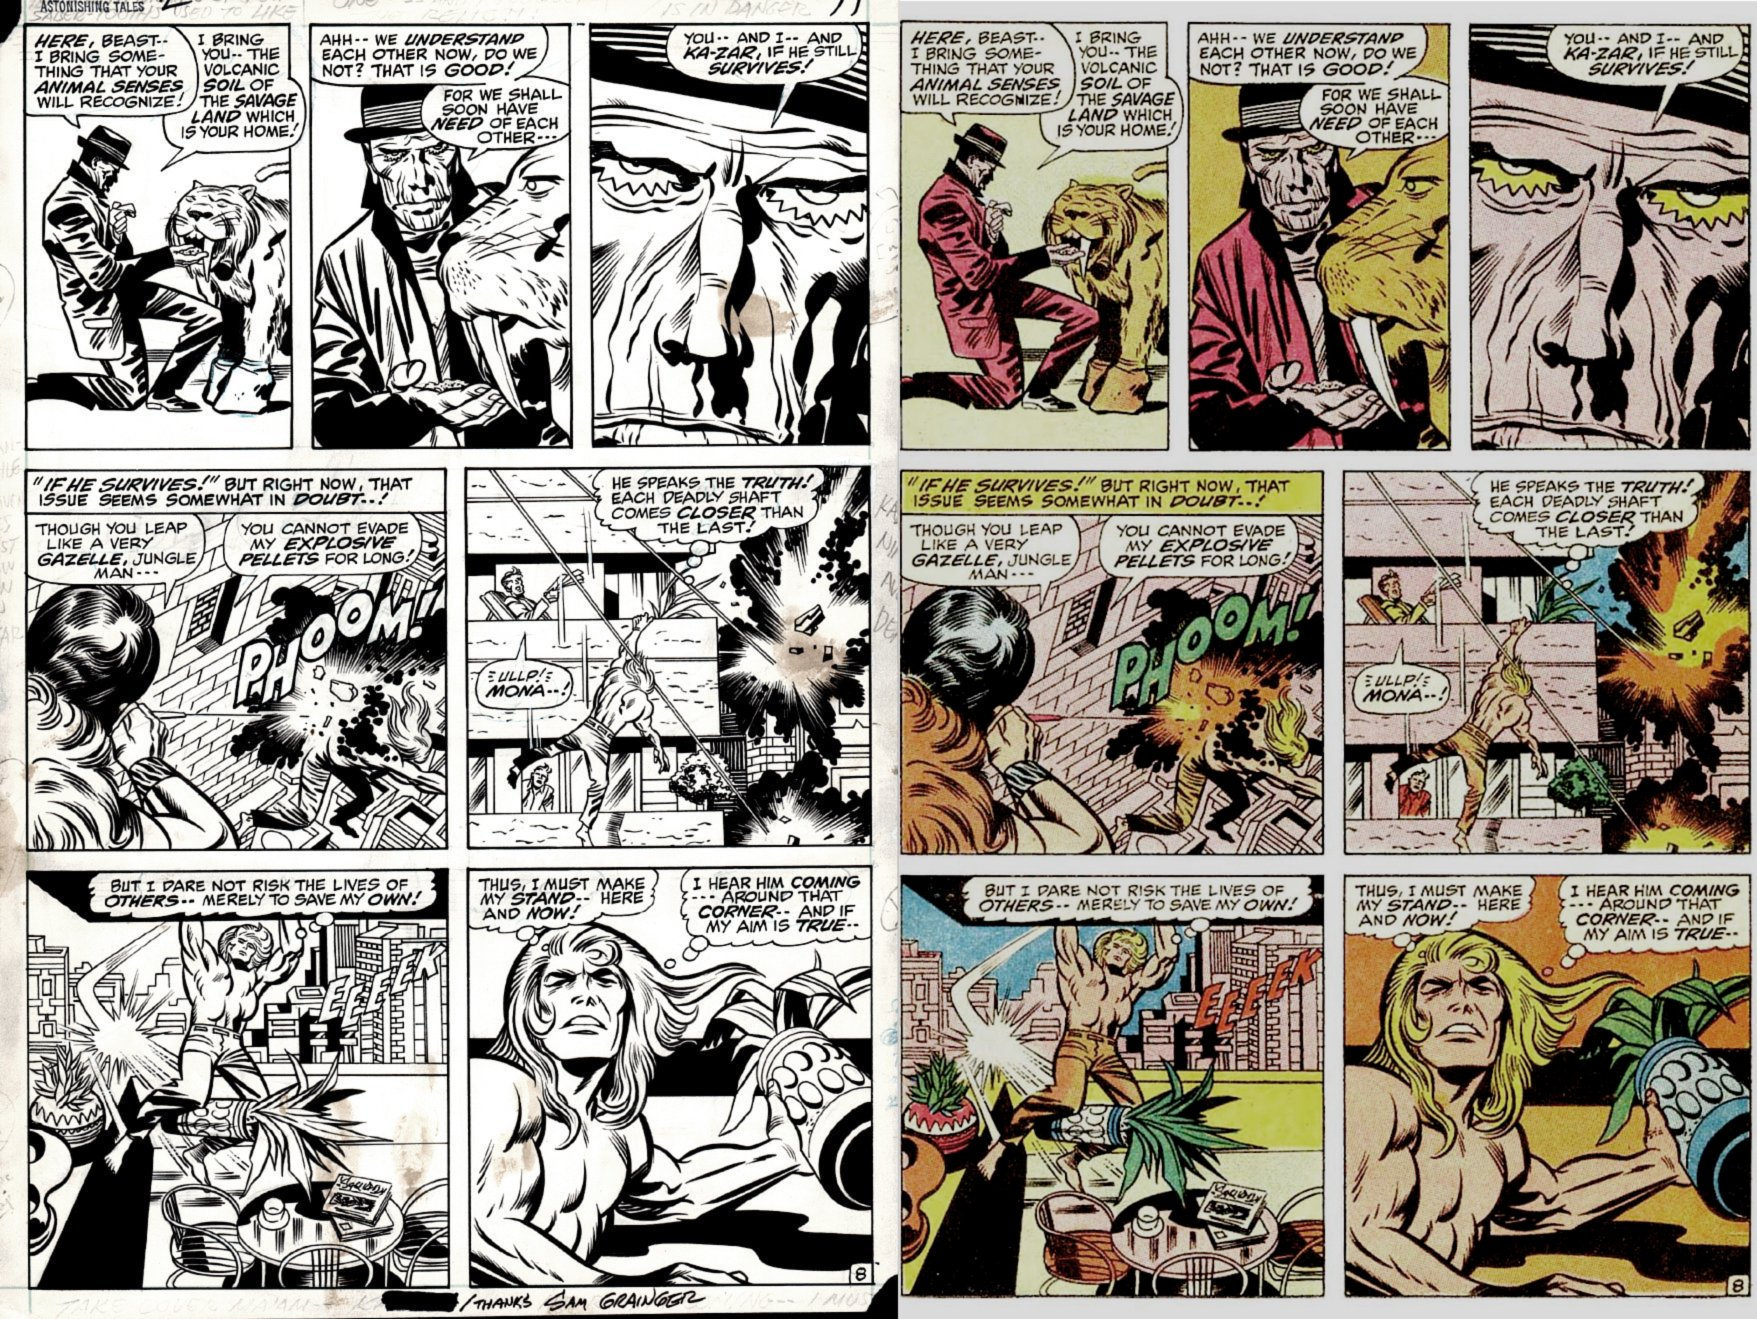 Astonishing Tales #2 p 8 (KA-ZAR BATTLES KRAVEN, VERY FIRST PETRIFIED MAN ISSUE!) 1970